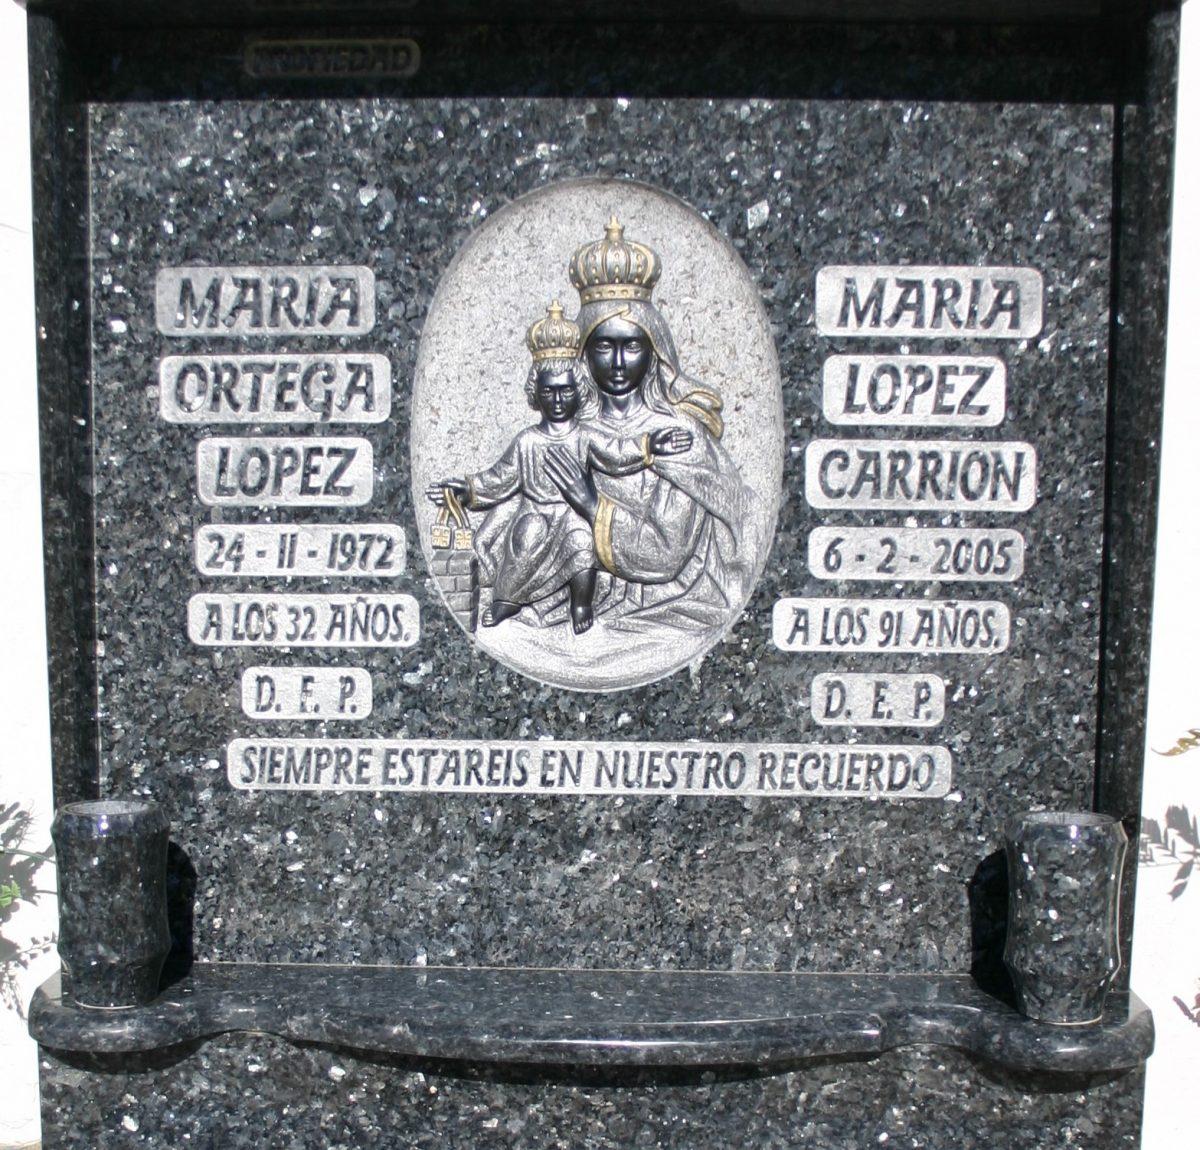 Placa-efecto-plata-Mármoles-Sánchez-Cazorla